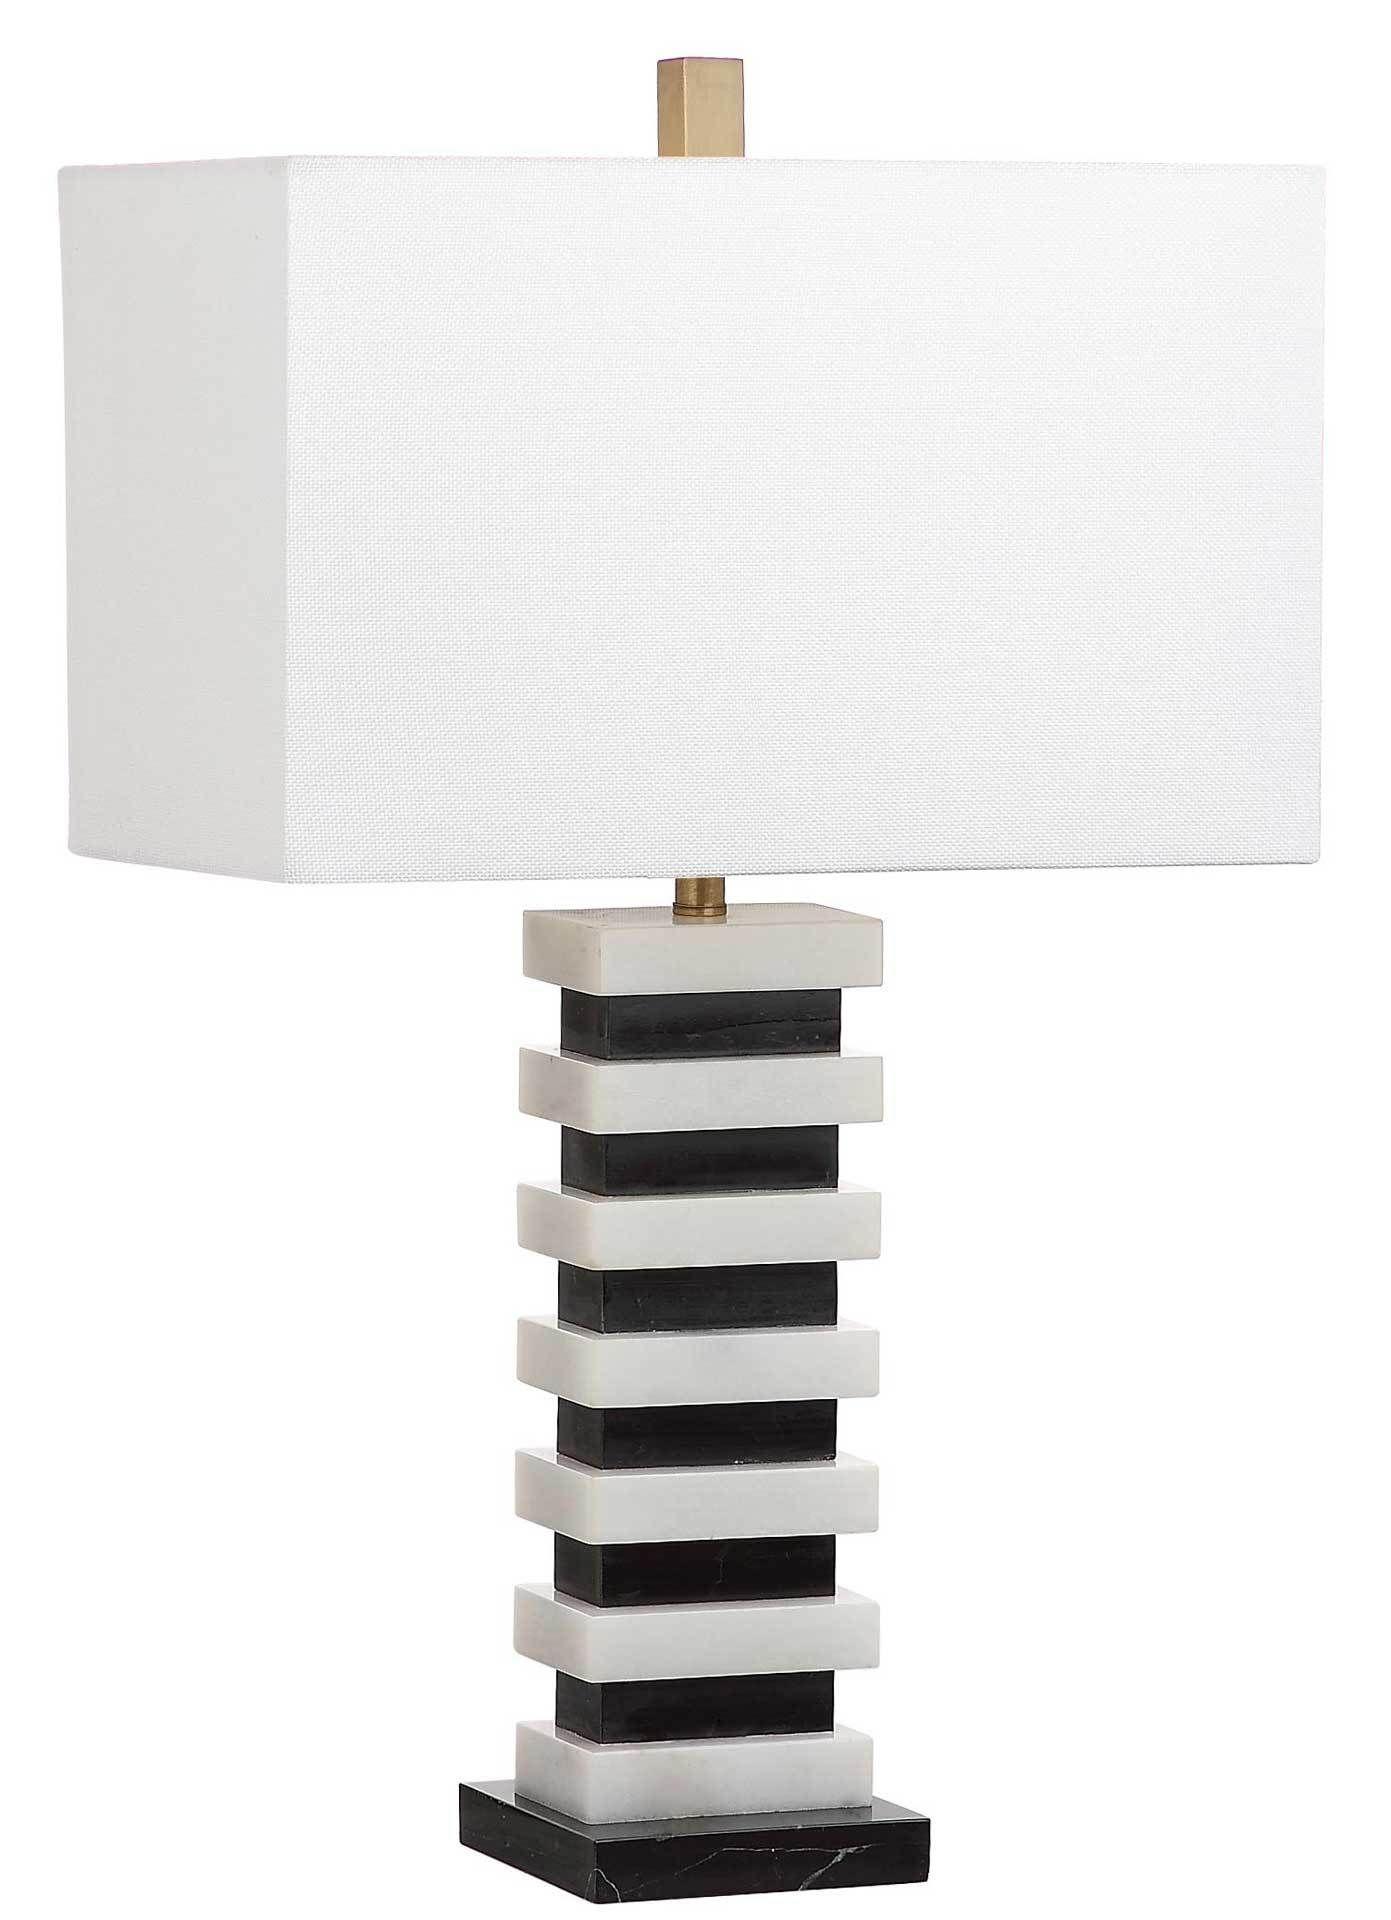 Hugo Marble Table Lamp Black White Black Table Lamps Table Lamp